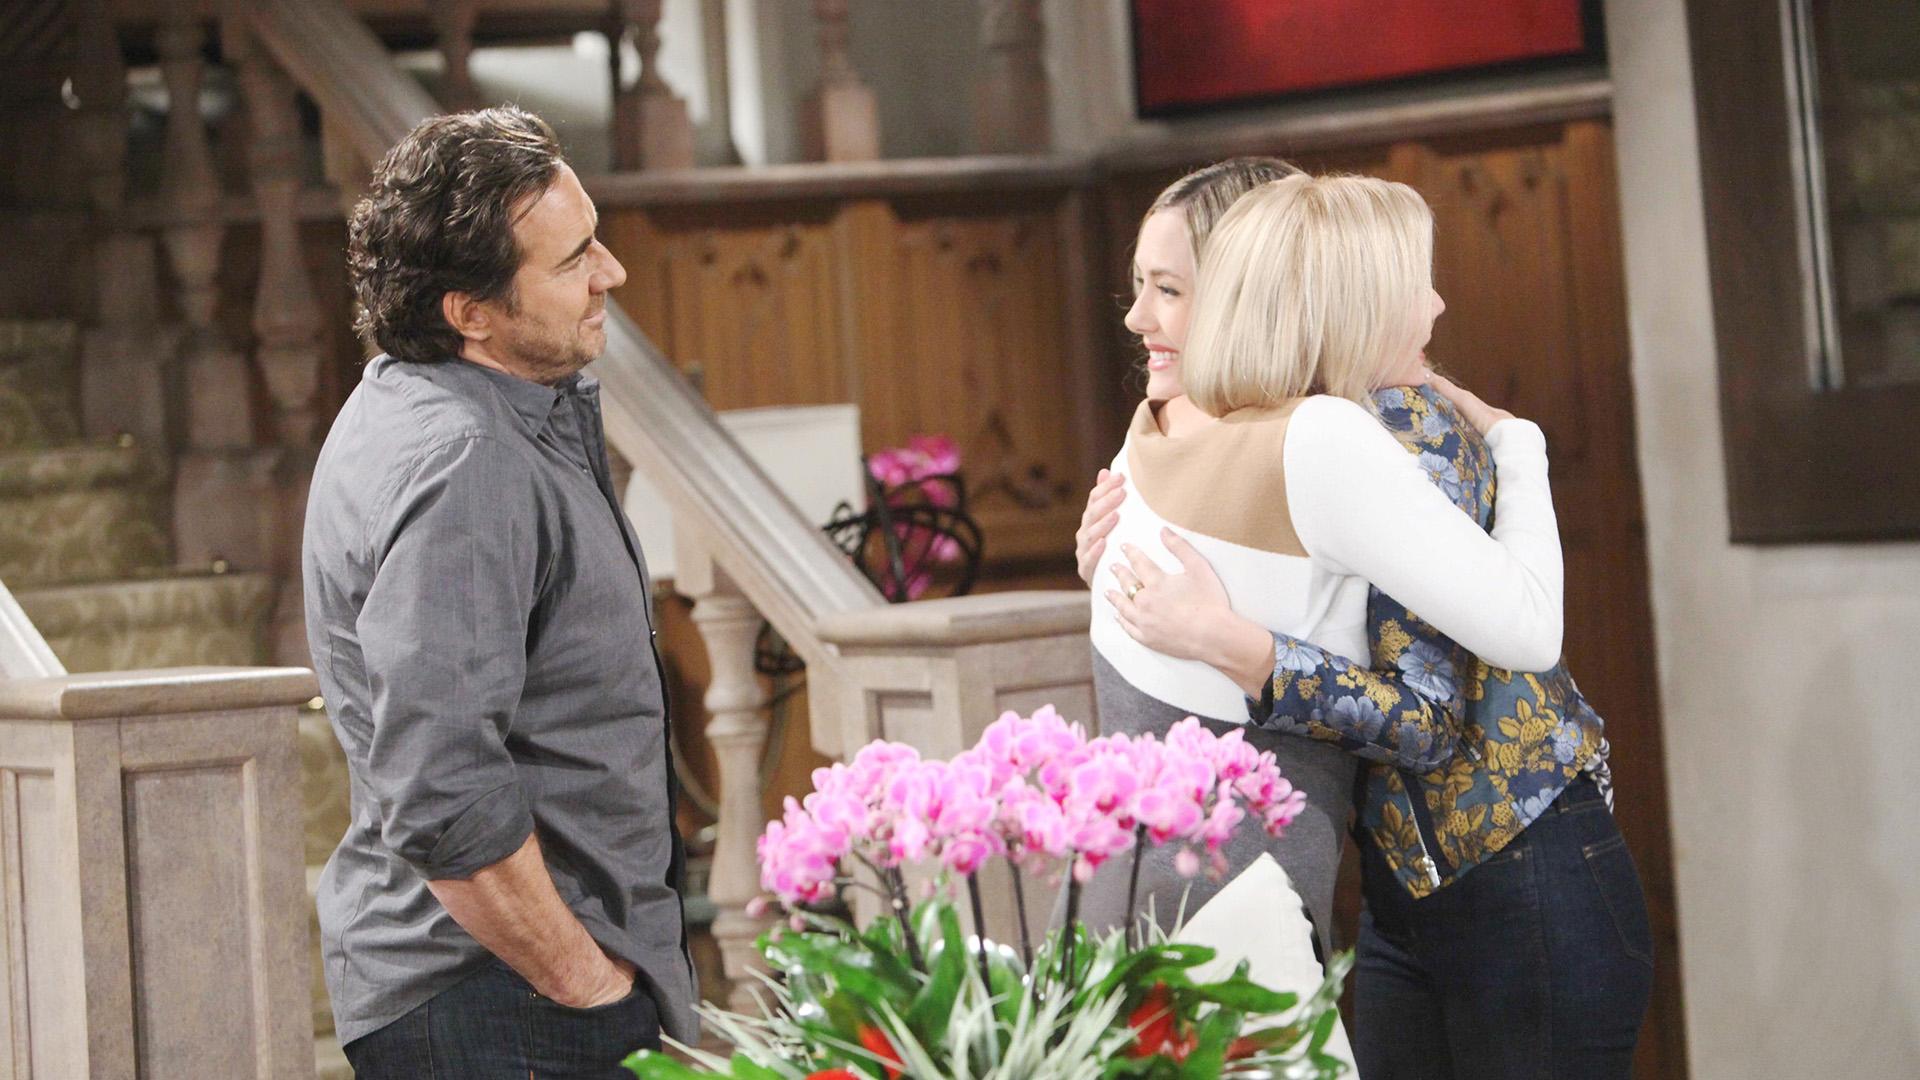 Ridge surprises Brooke by bringing her daughter, Hope, back to Los Angeles.